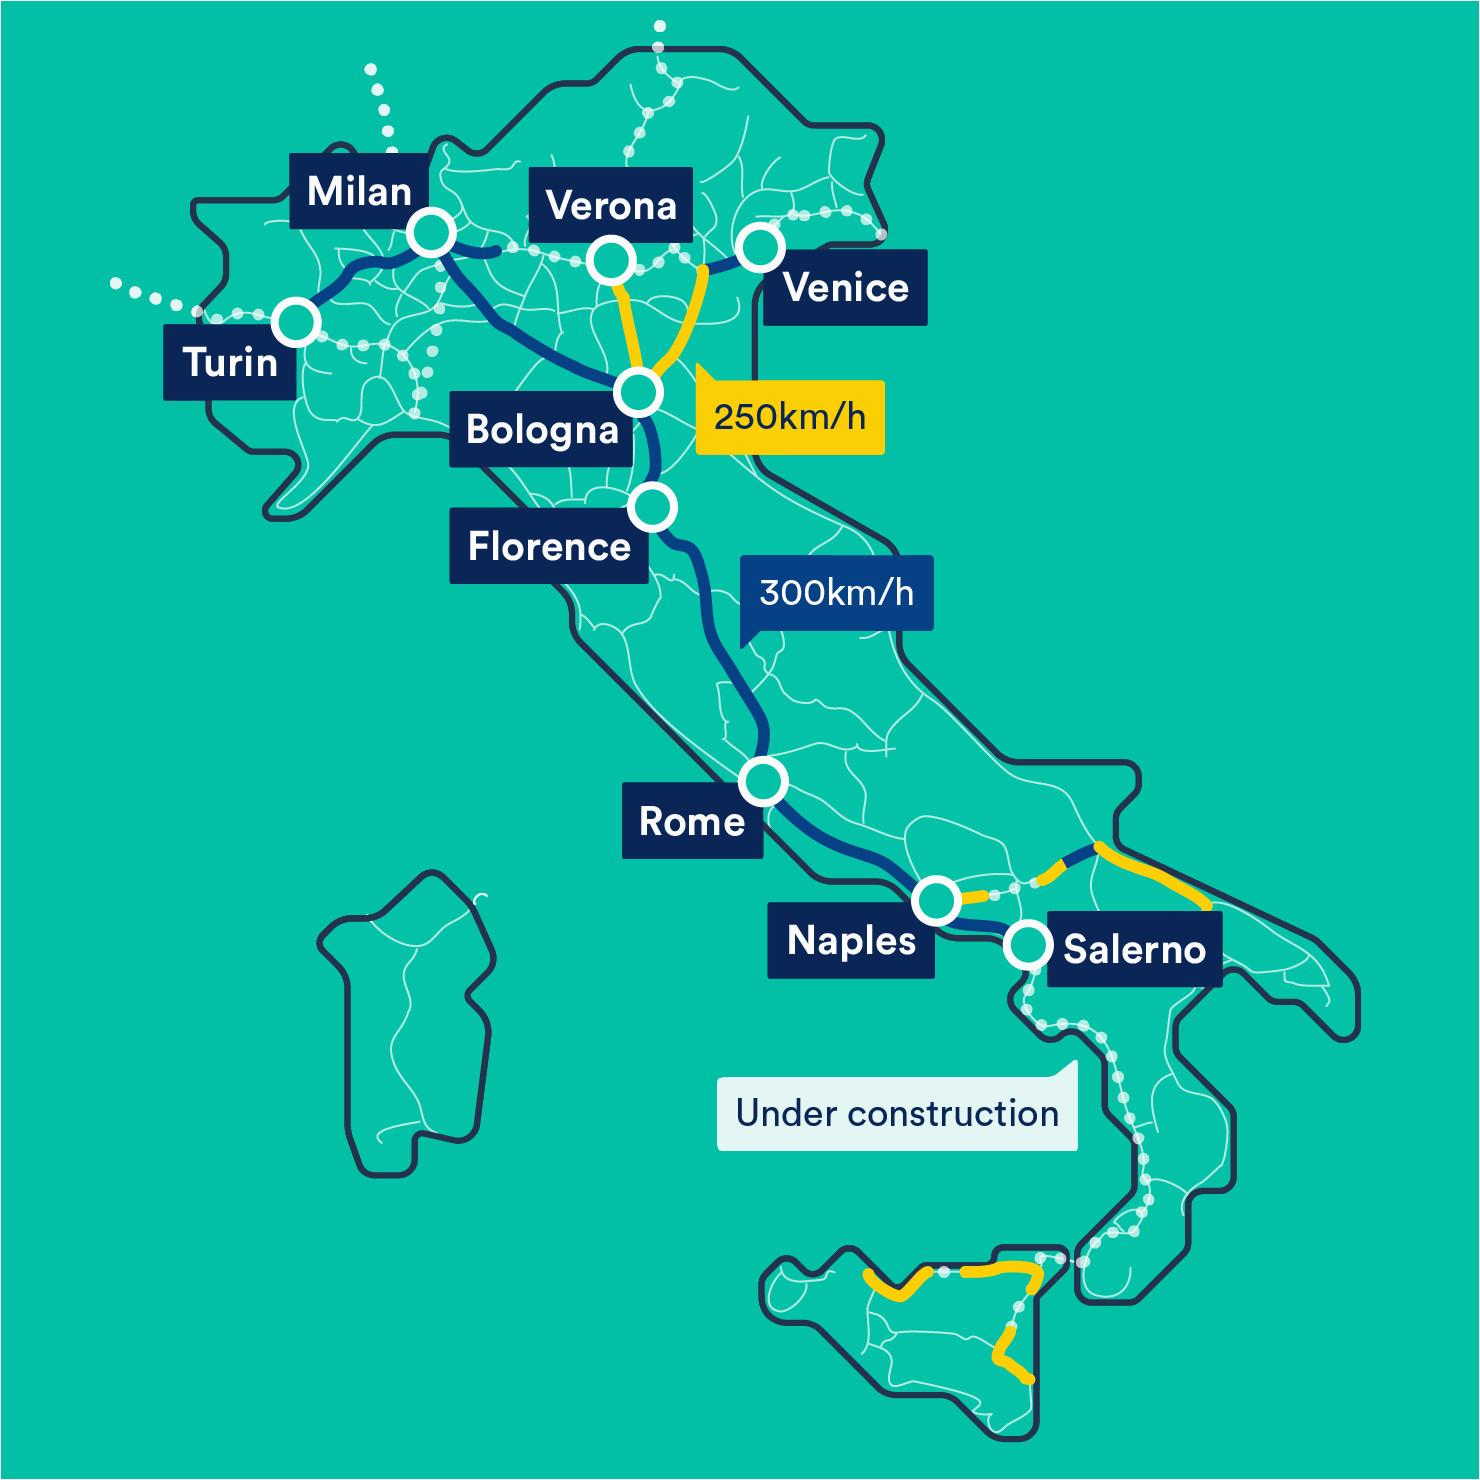 Map Of Trains In Italy.Map Of Trains In Italy Secretmuseum